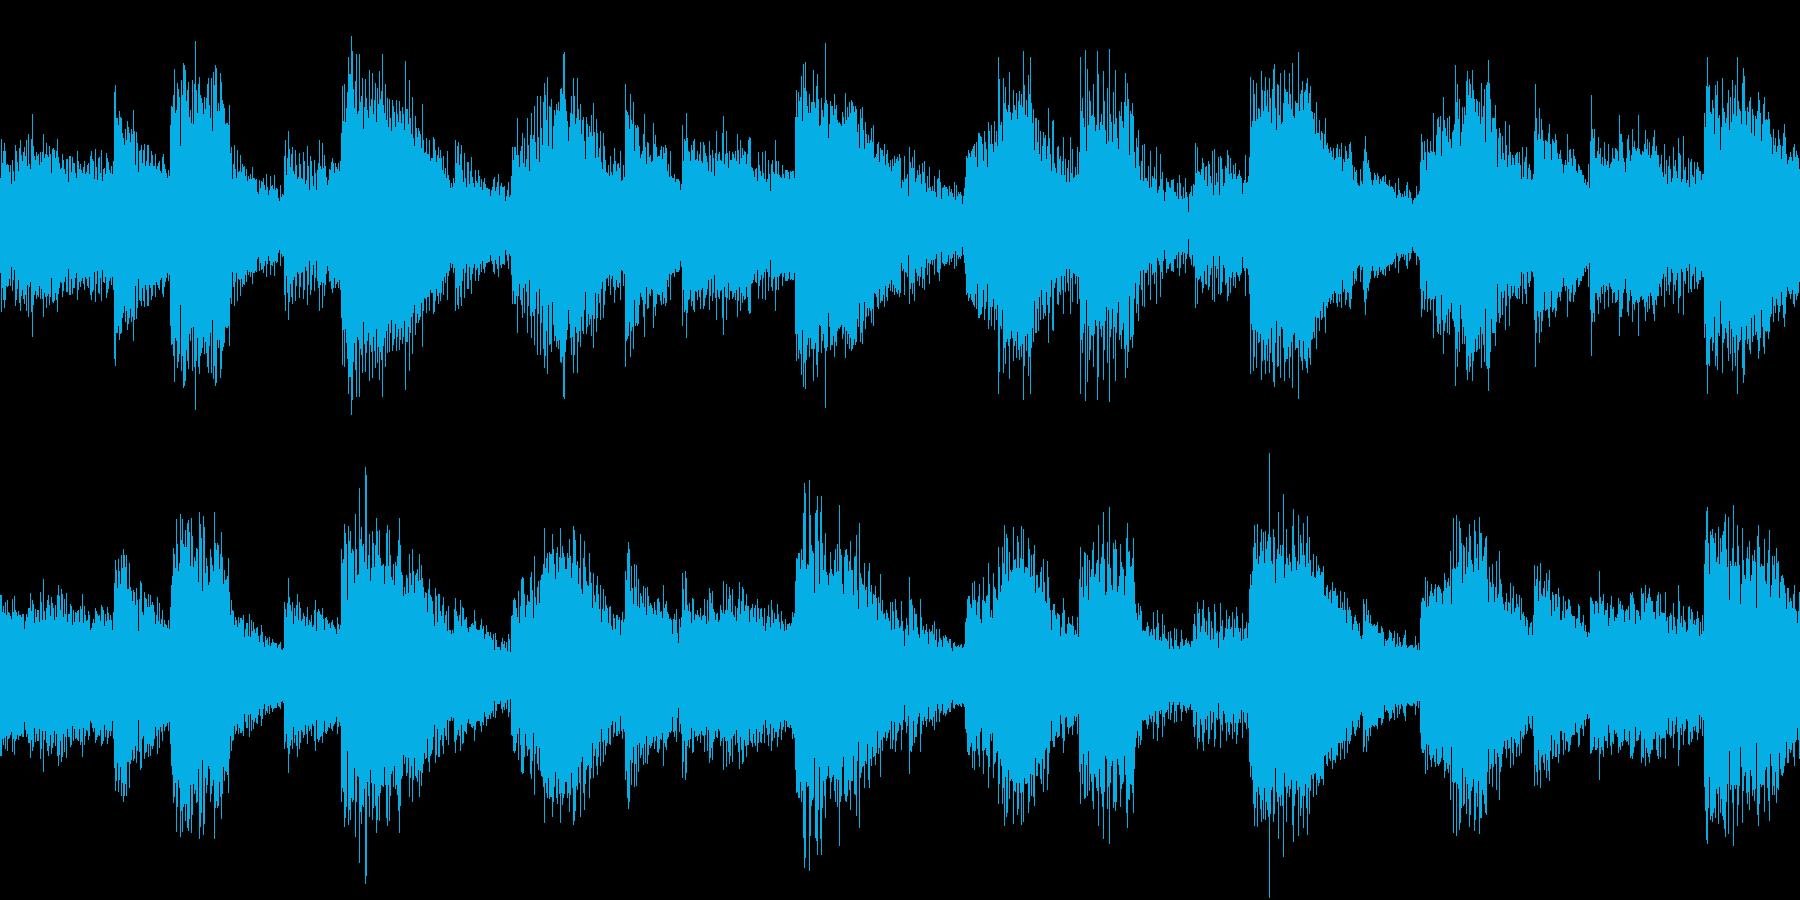 EDM Lead Loop BPM128の再生済みの波形